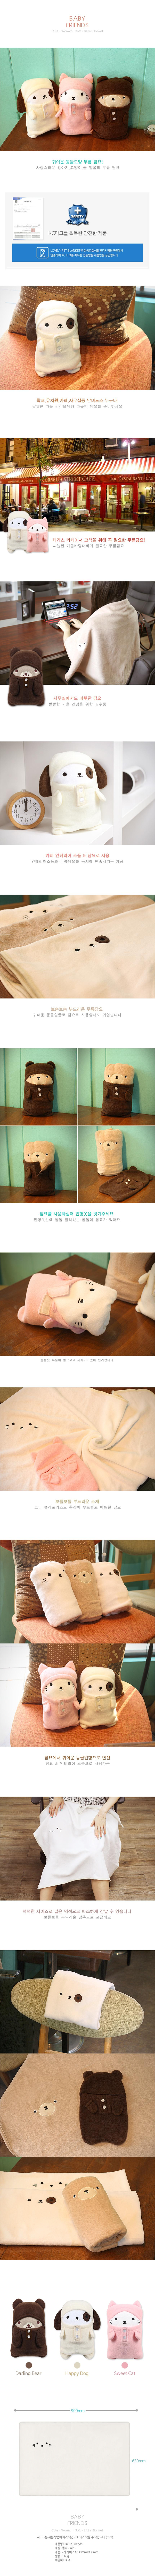 [BEAT] 귀요운 동물 무릎담요 쿠션 FRIENDS - 히키스, 9,900원, 담요/블랑켓, 캐릭터/일러스트